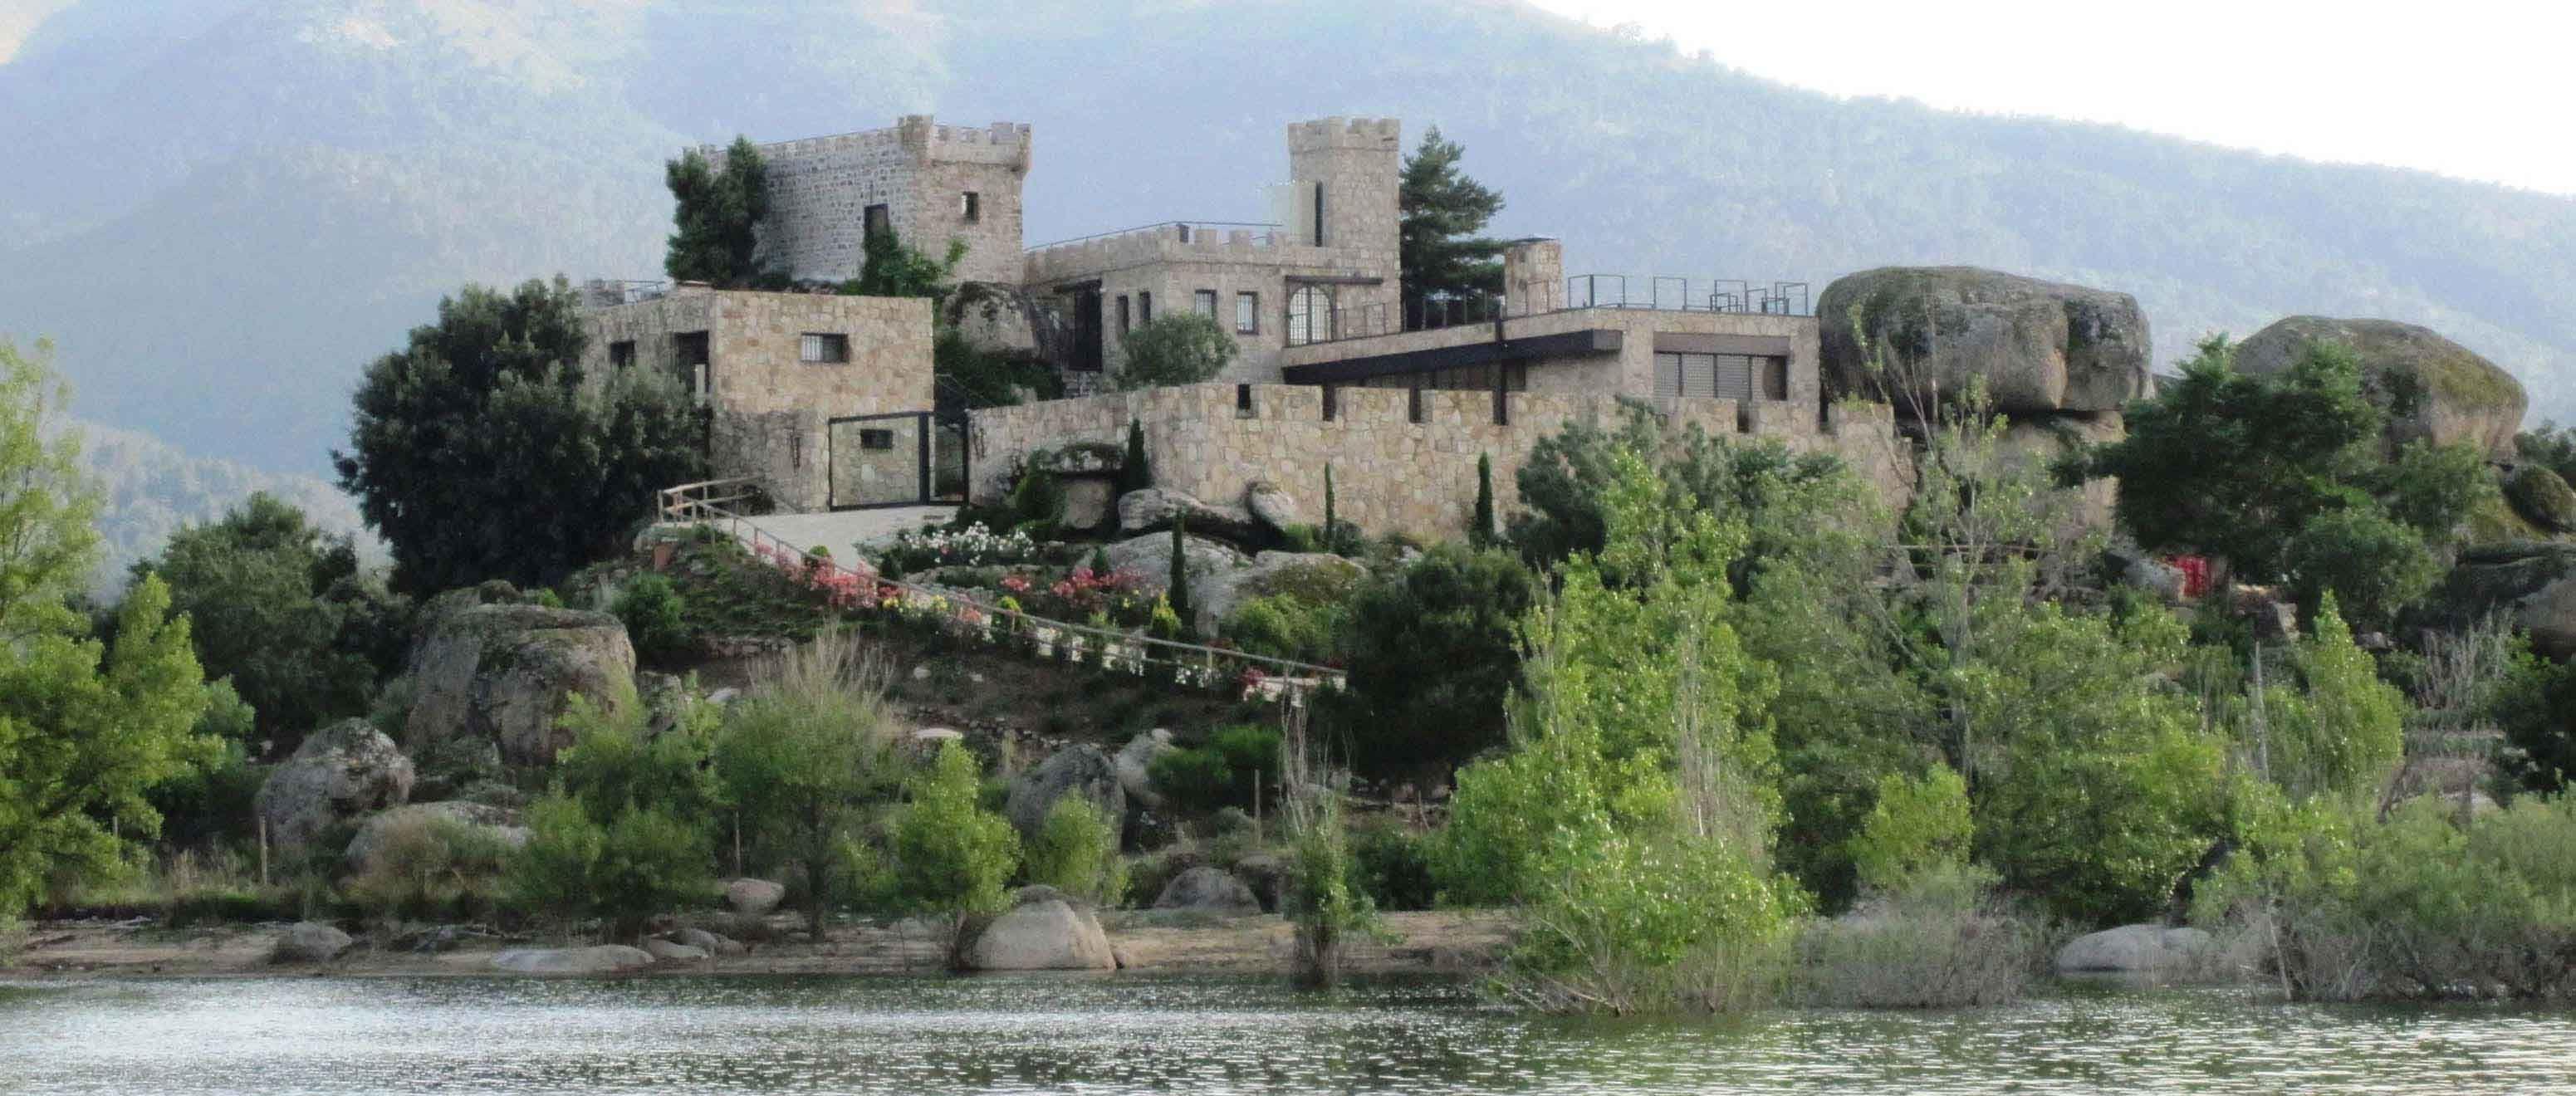 castillo en venta en isla centinela (ávila)